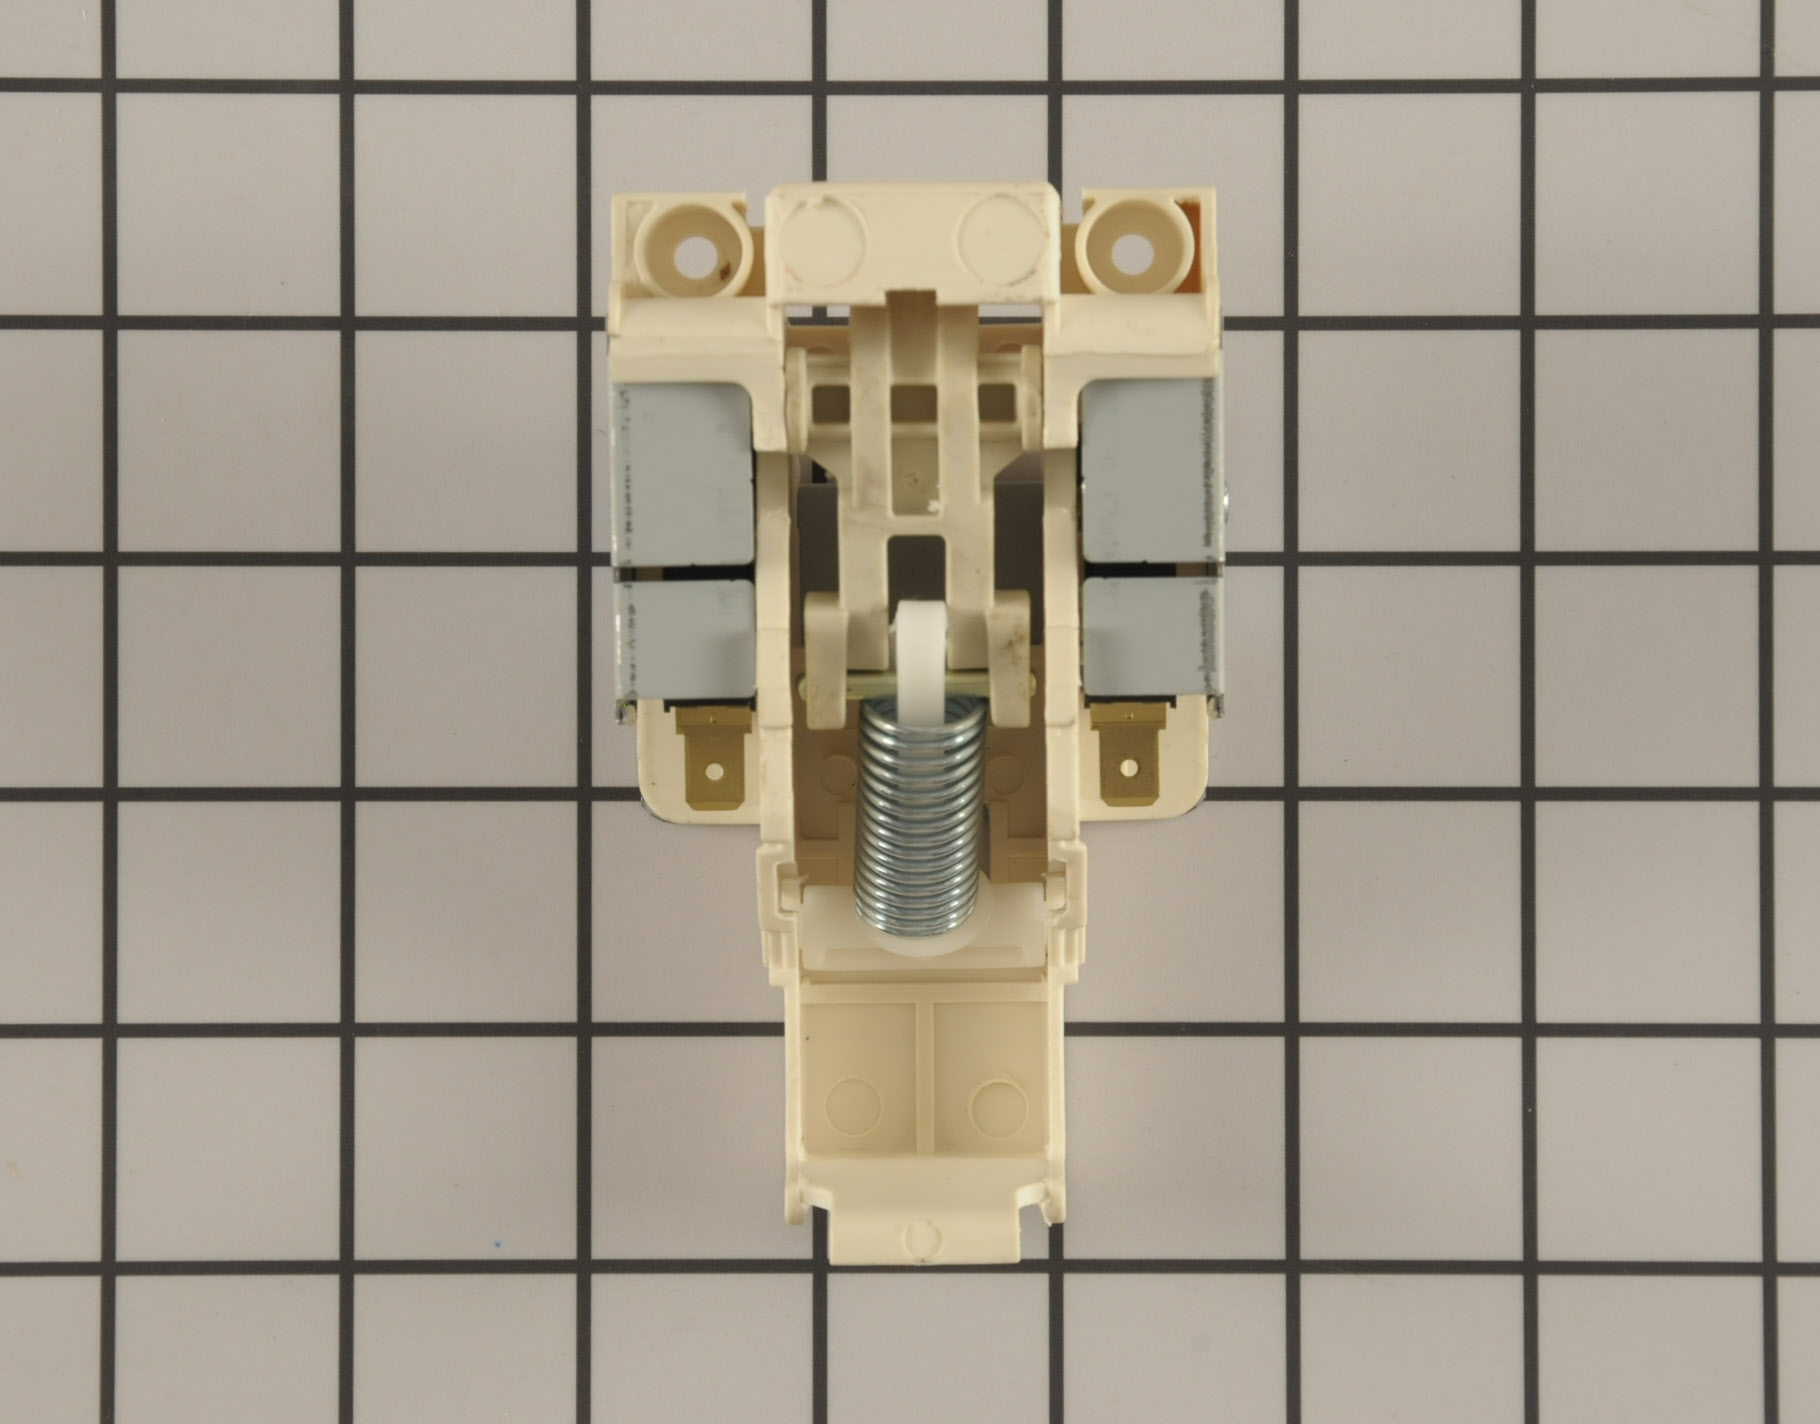 LG Dishwasher Part # 4027ED3002A - Door Latch